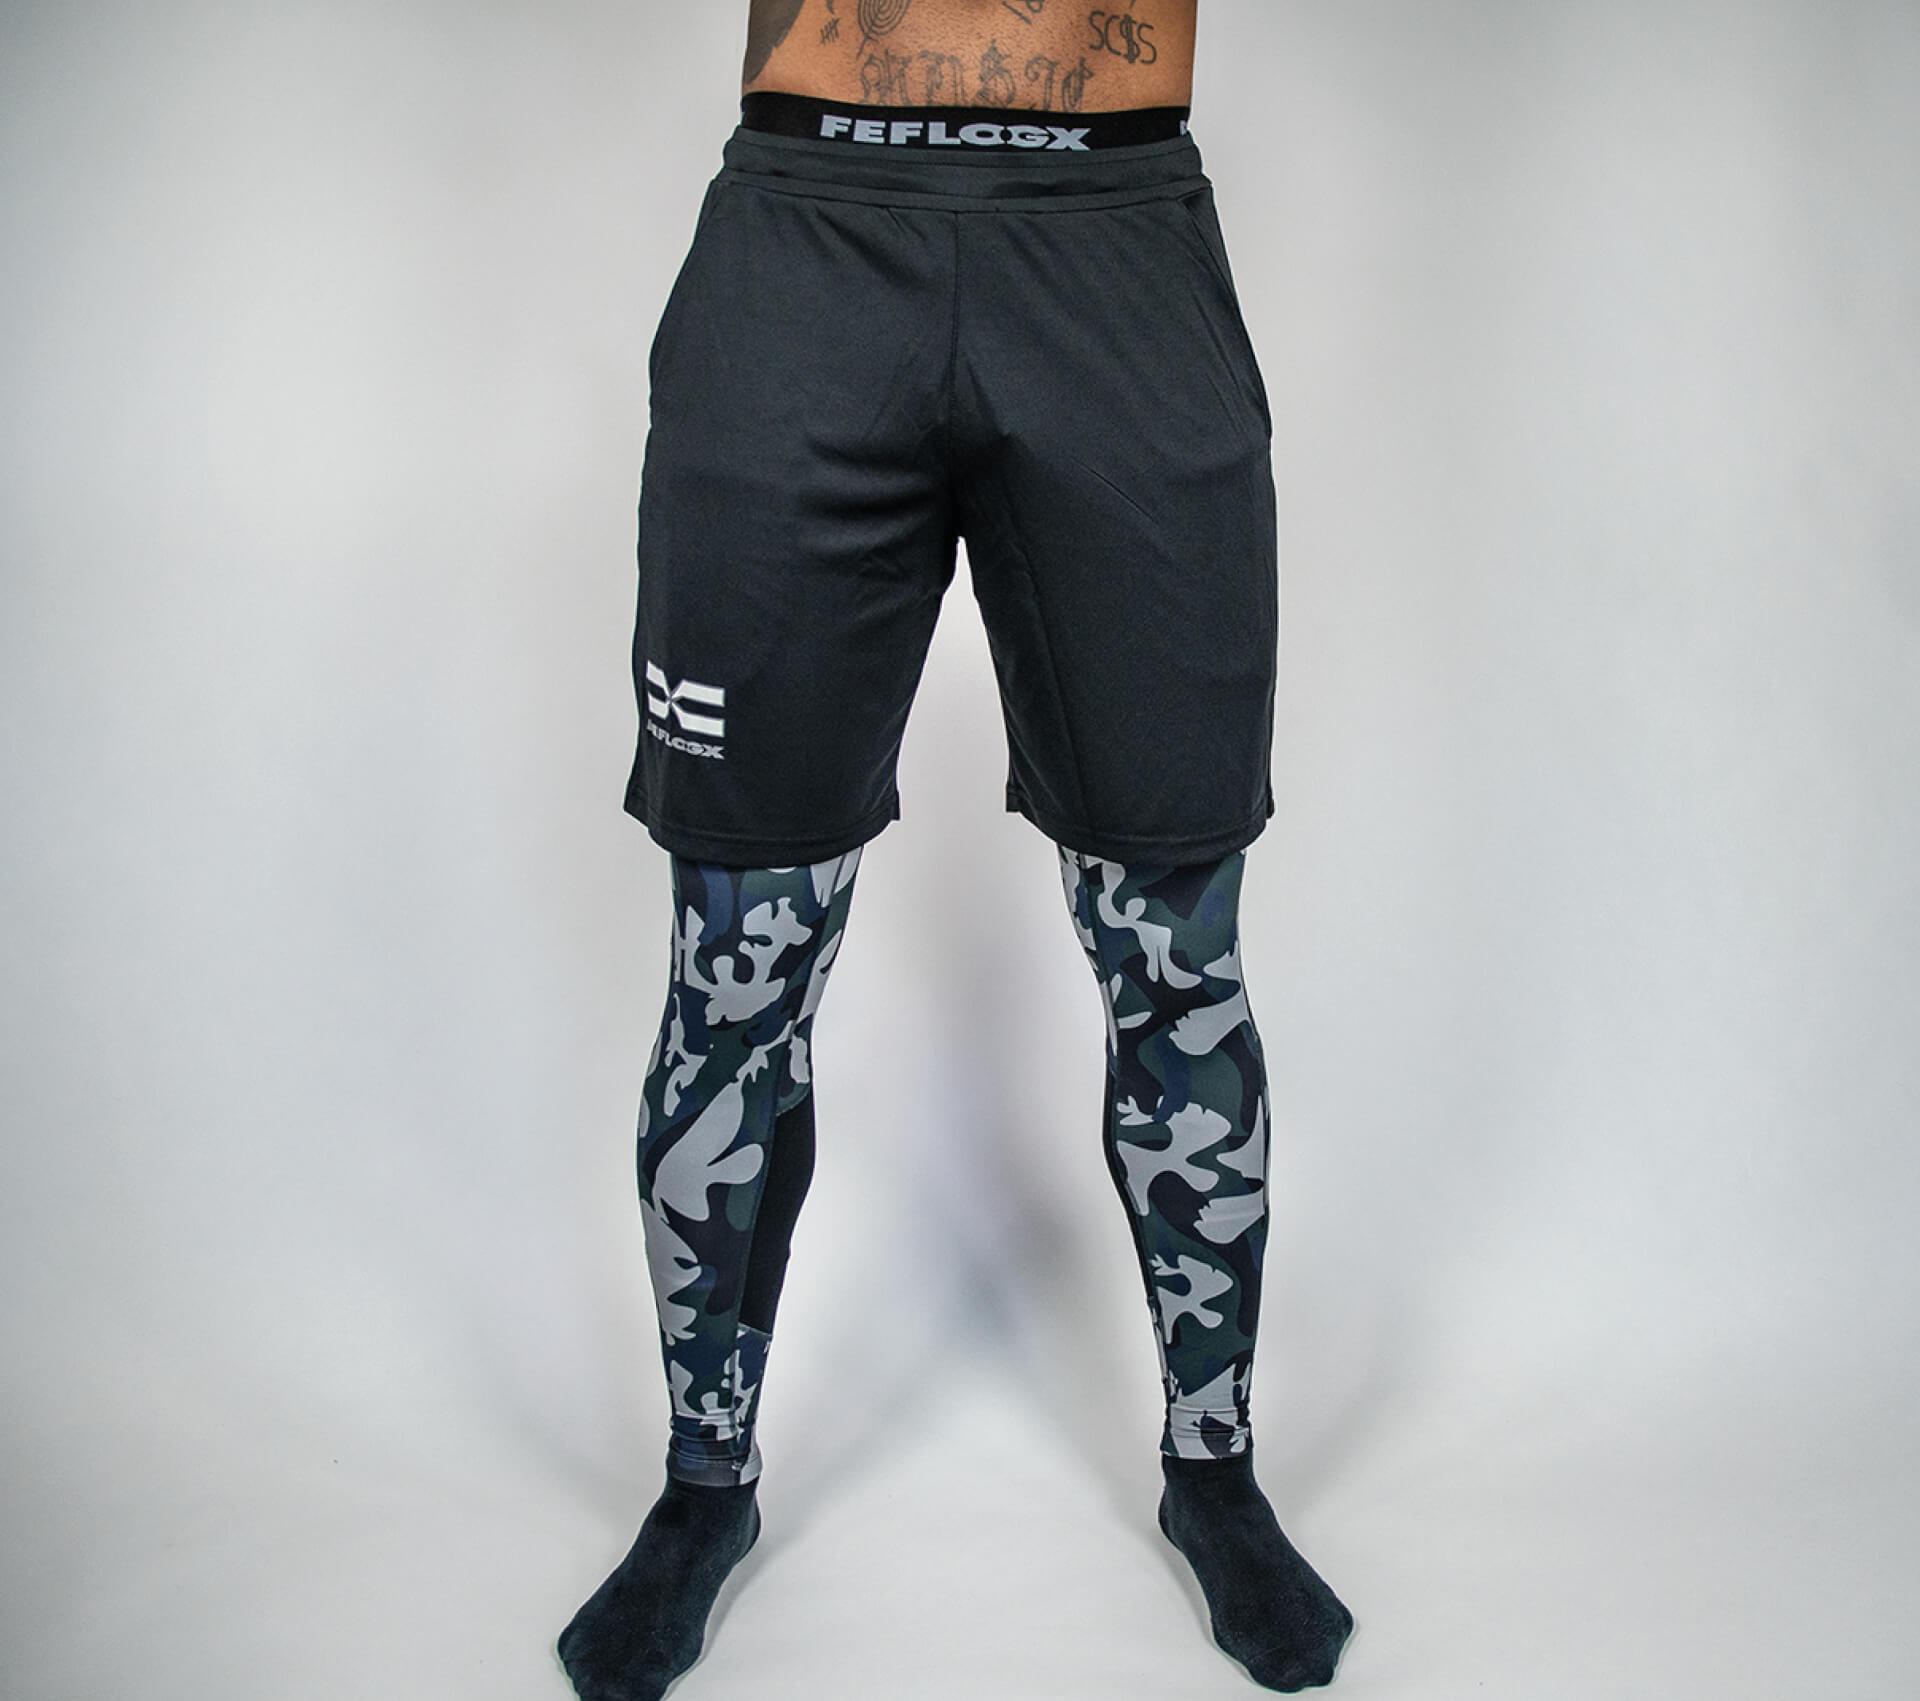 FEFLOGX Sportswear Men Leggings und Allrounder-Shorts-Kombi.